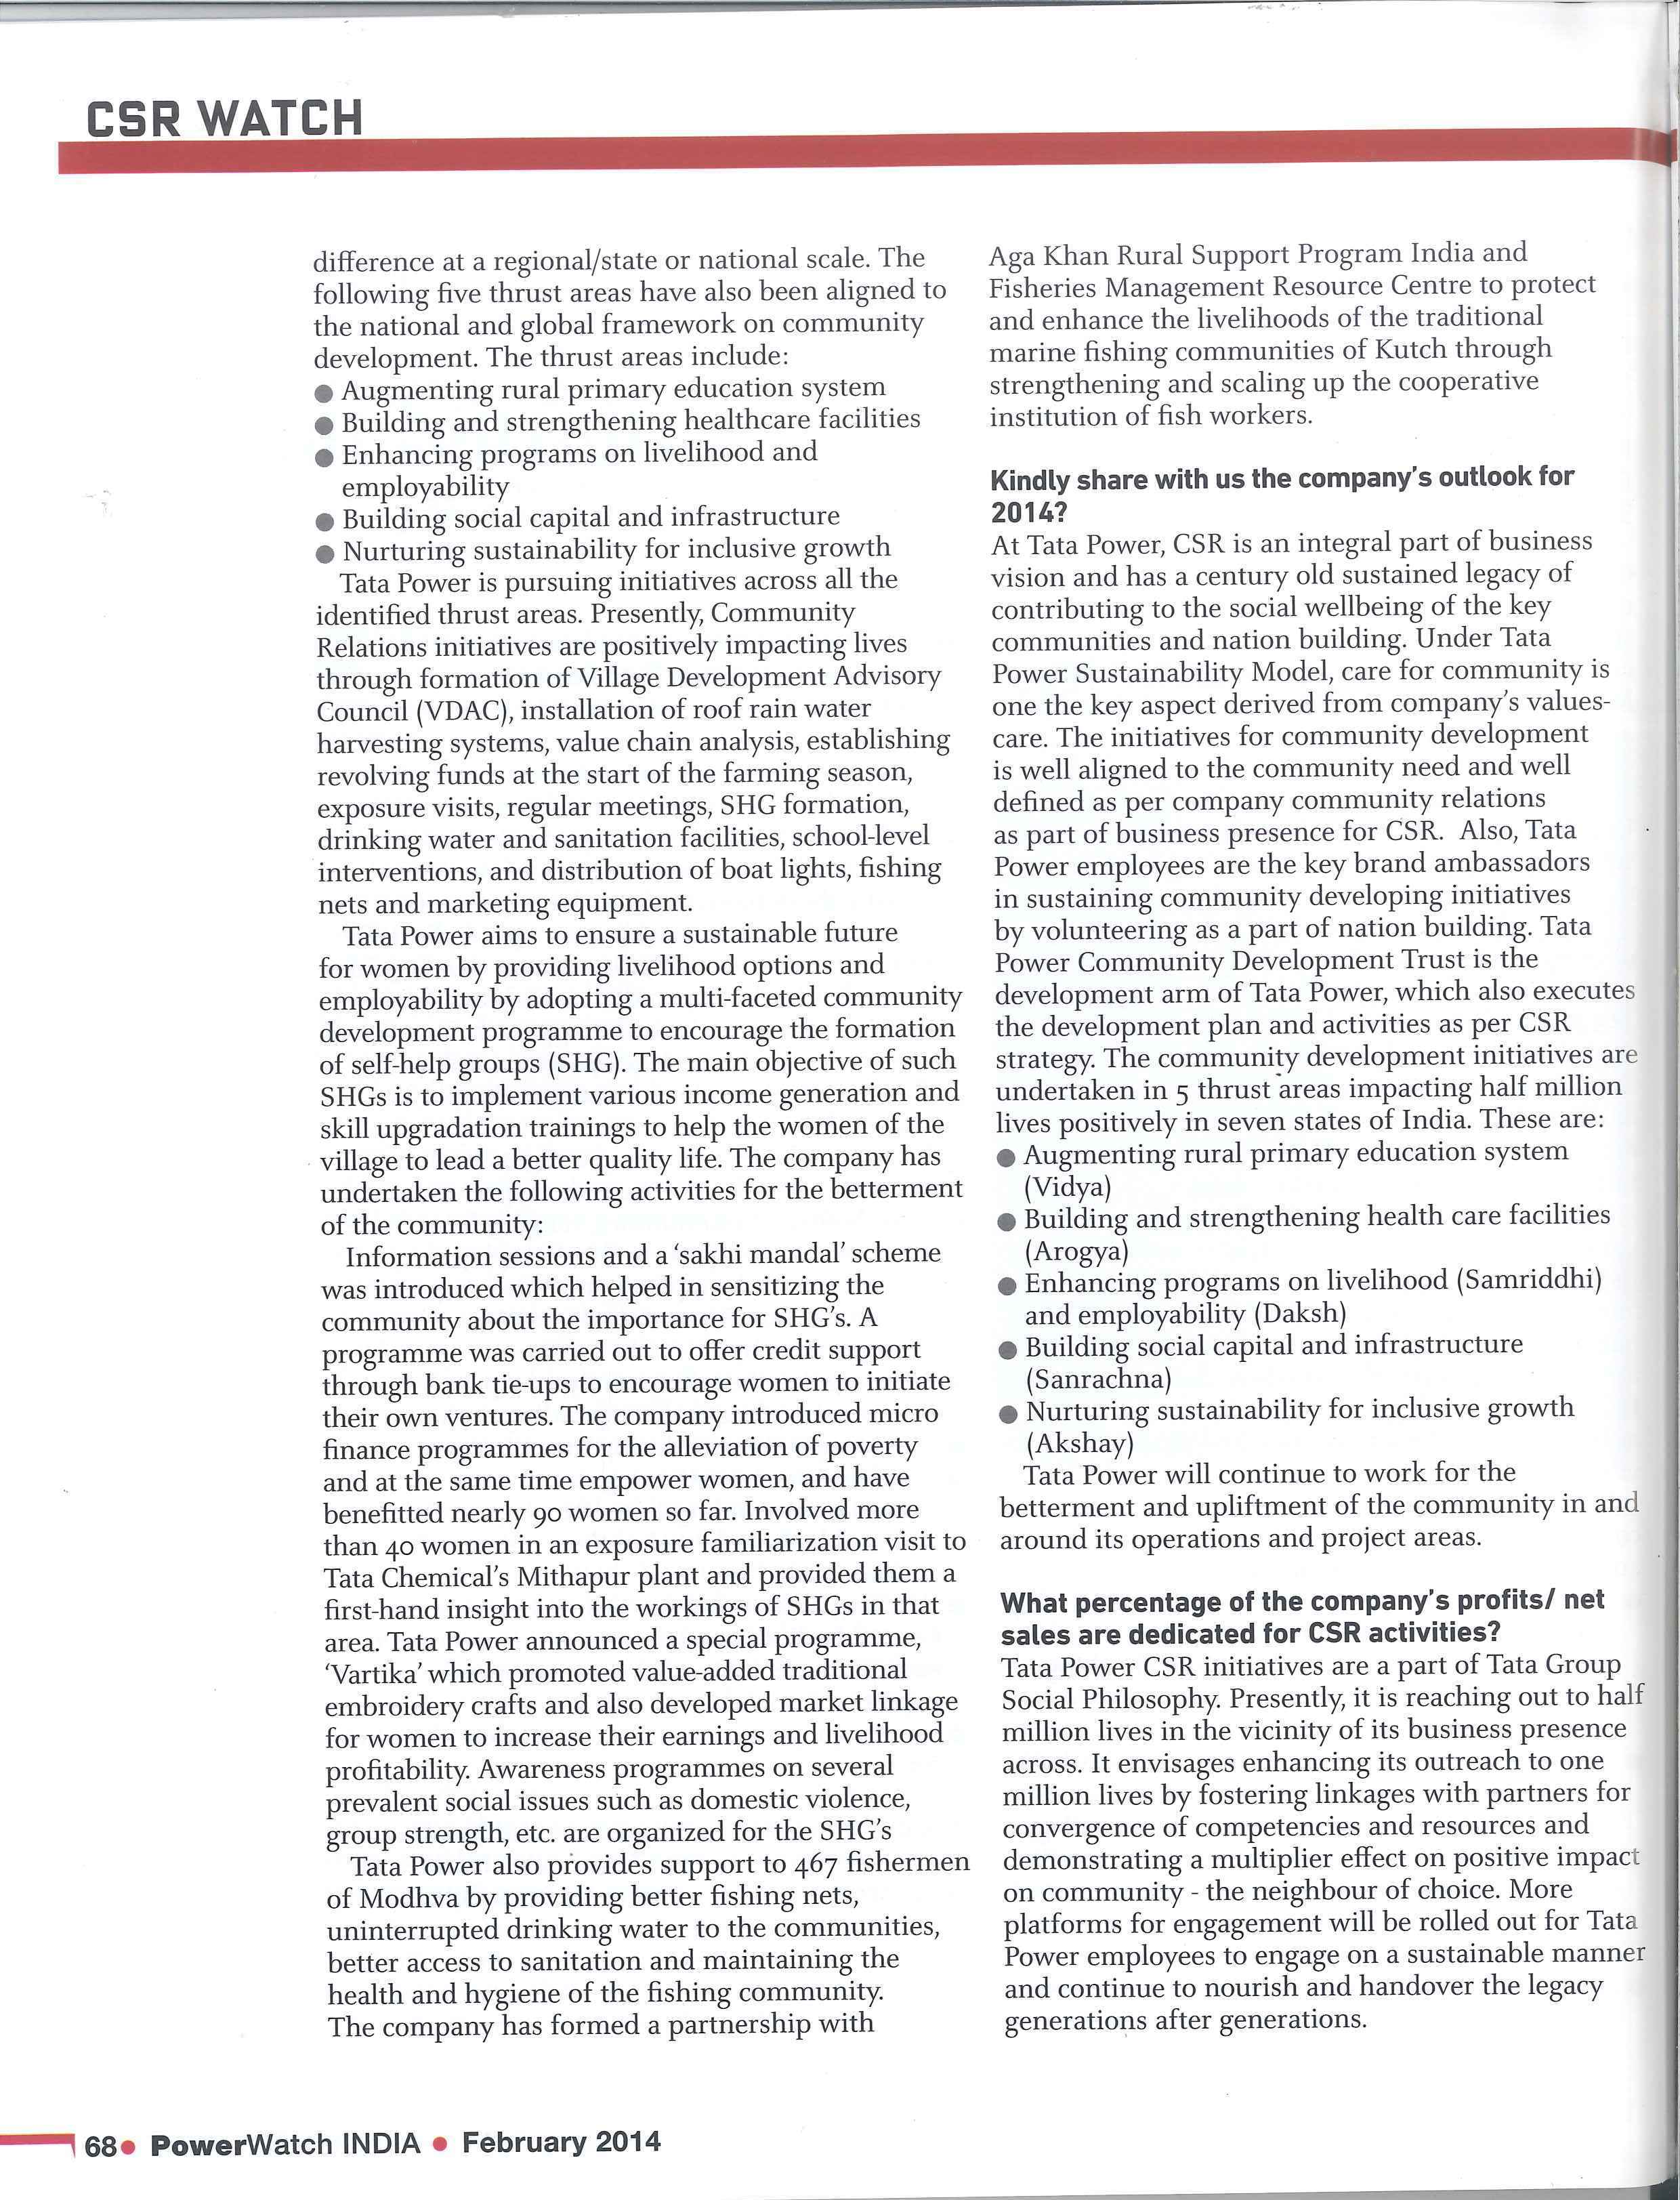 Power Watch Magazine on Mundra UMPP Community Initiatives